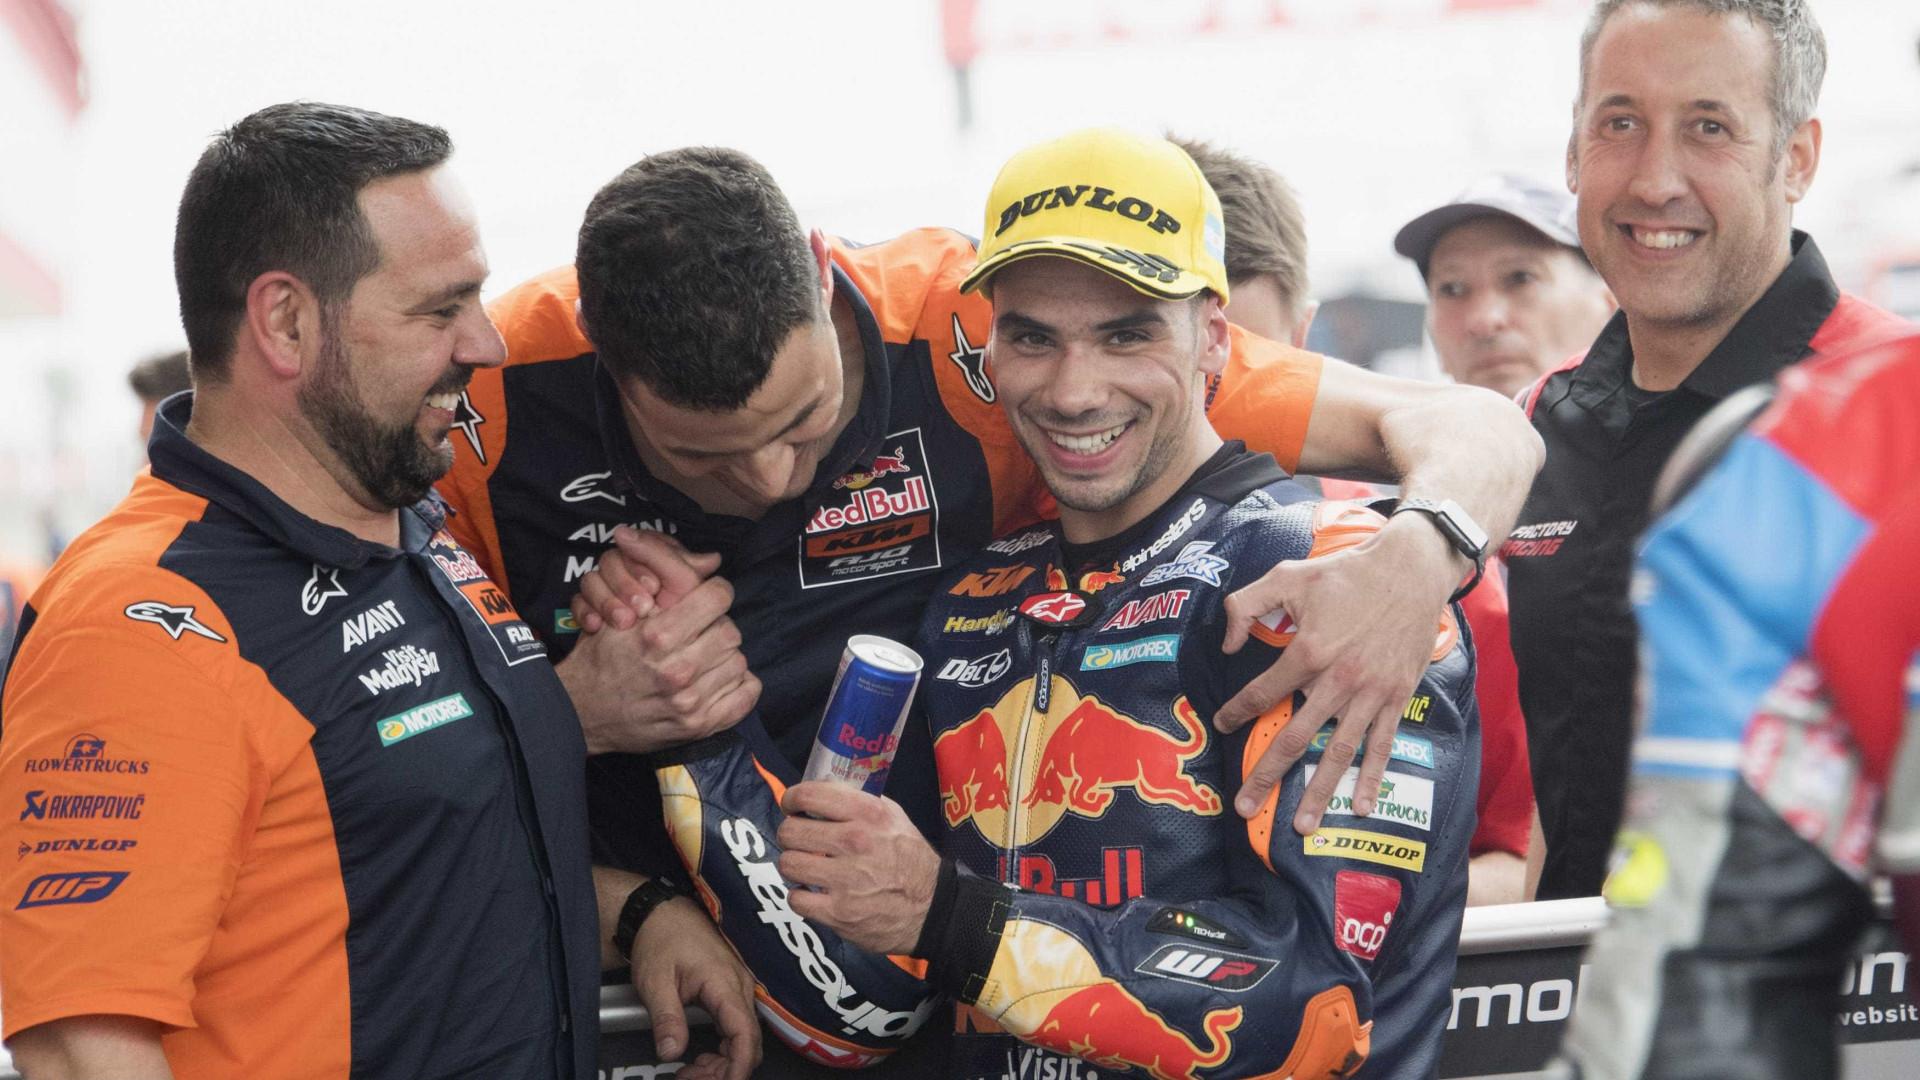 PSP 'perdoa' e dá os parabéns a Miguel Oliveira